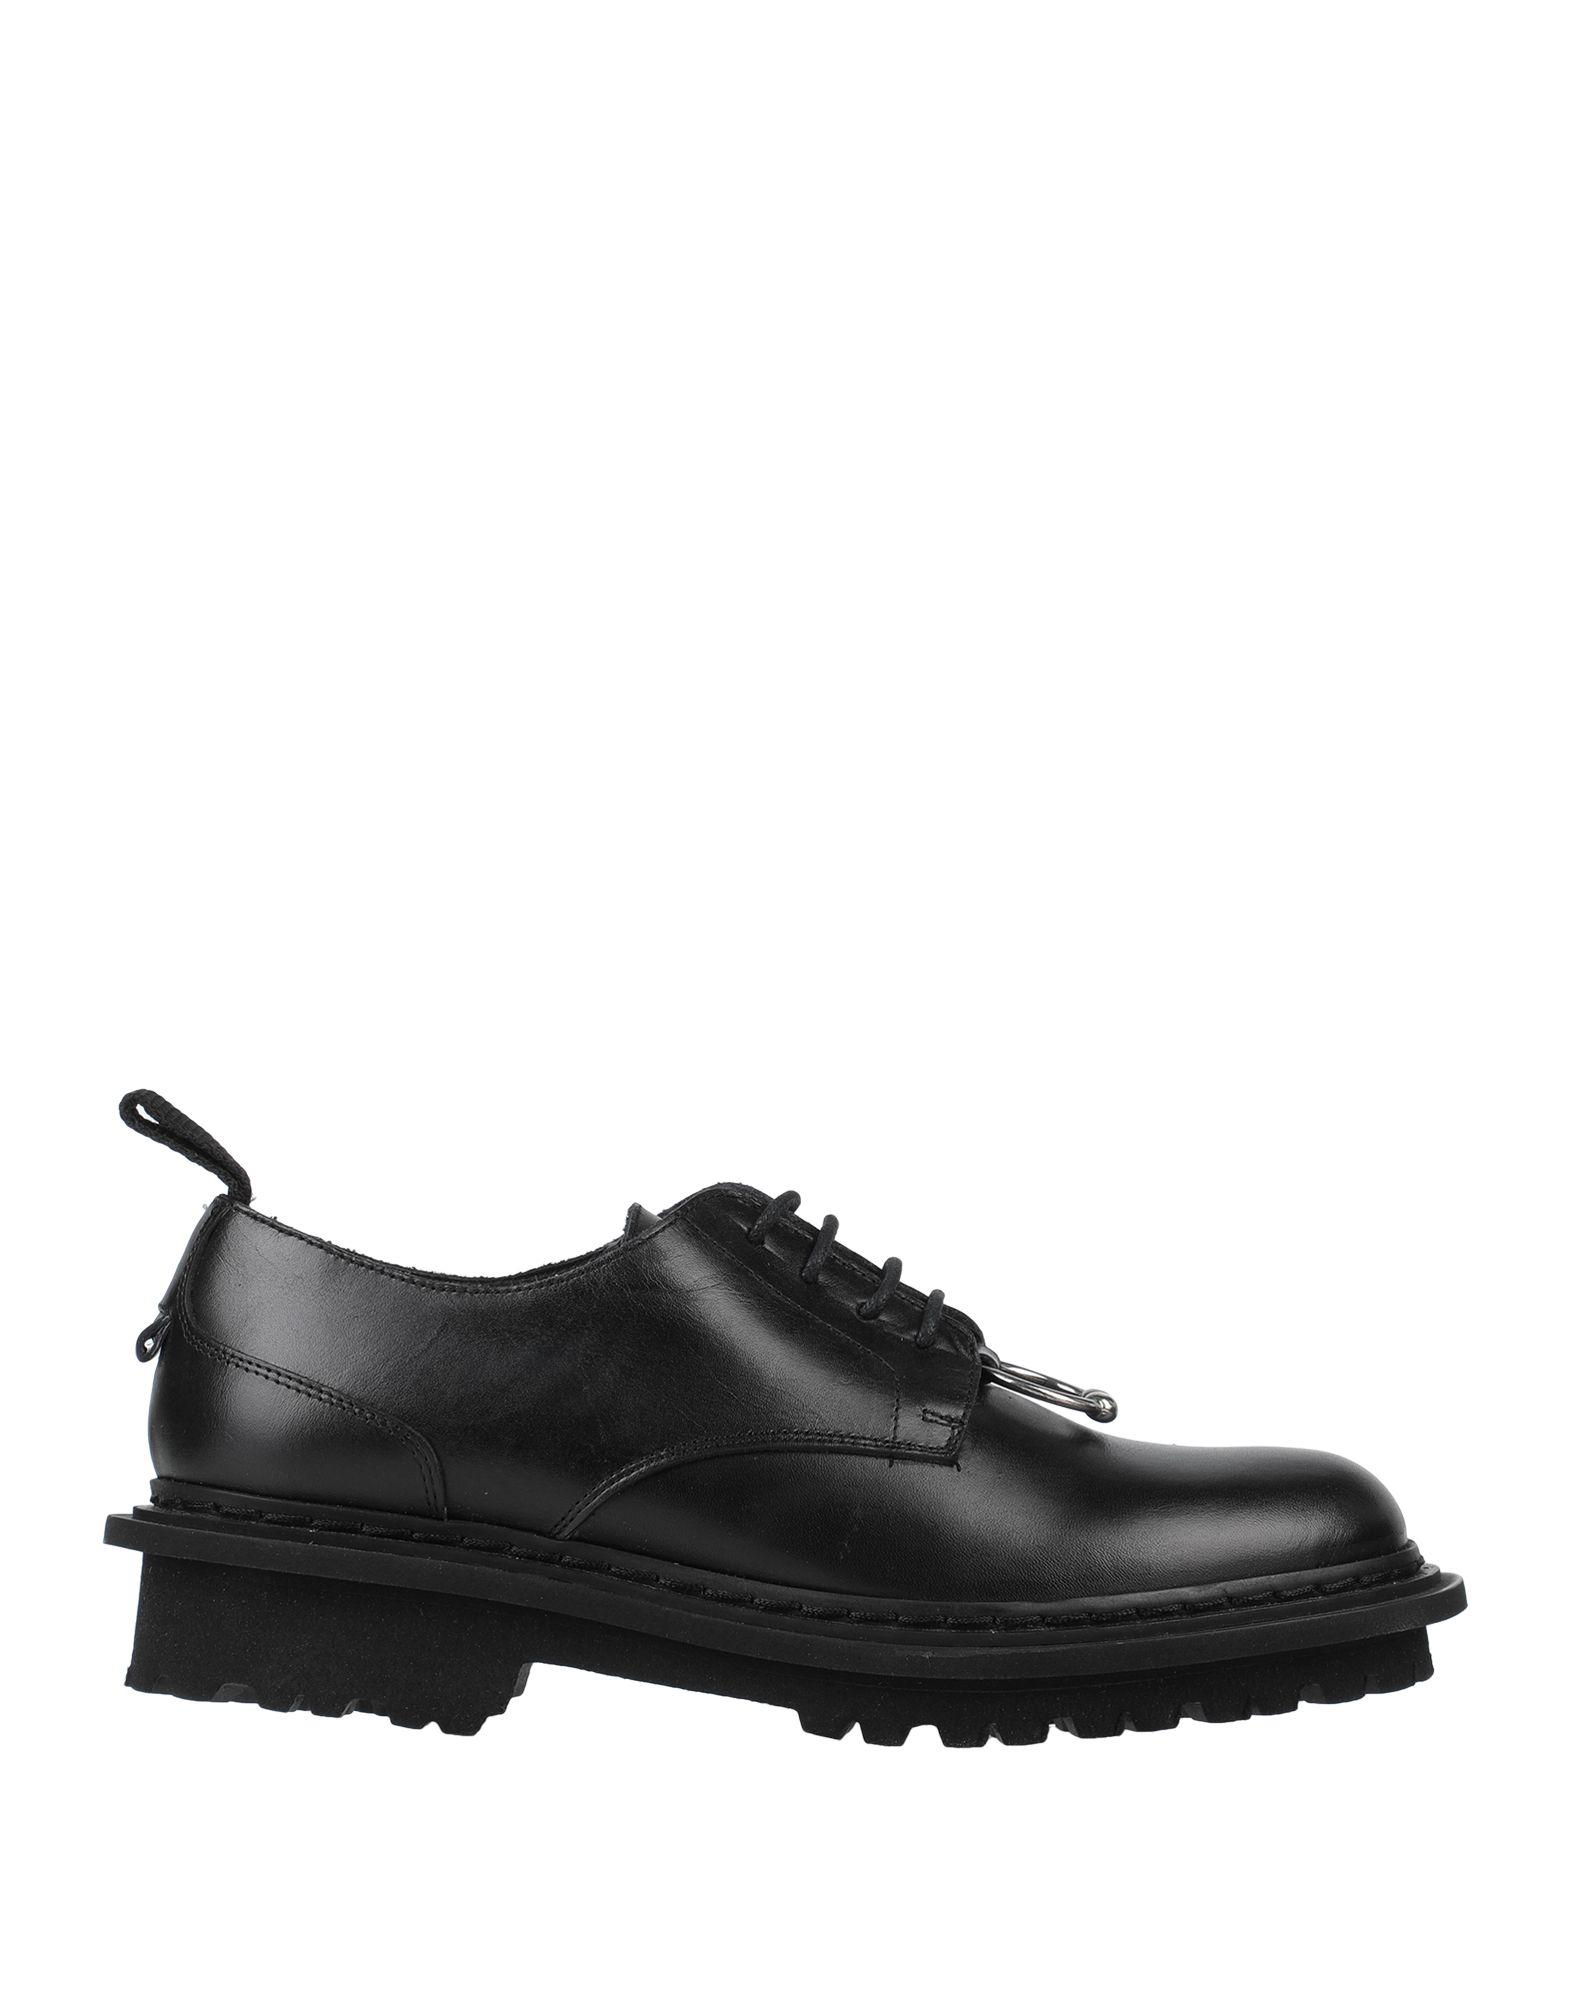 NEIL BARRETT Обувь на шнурках barrett обувь на шнурках